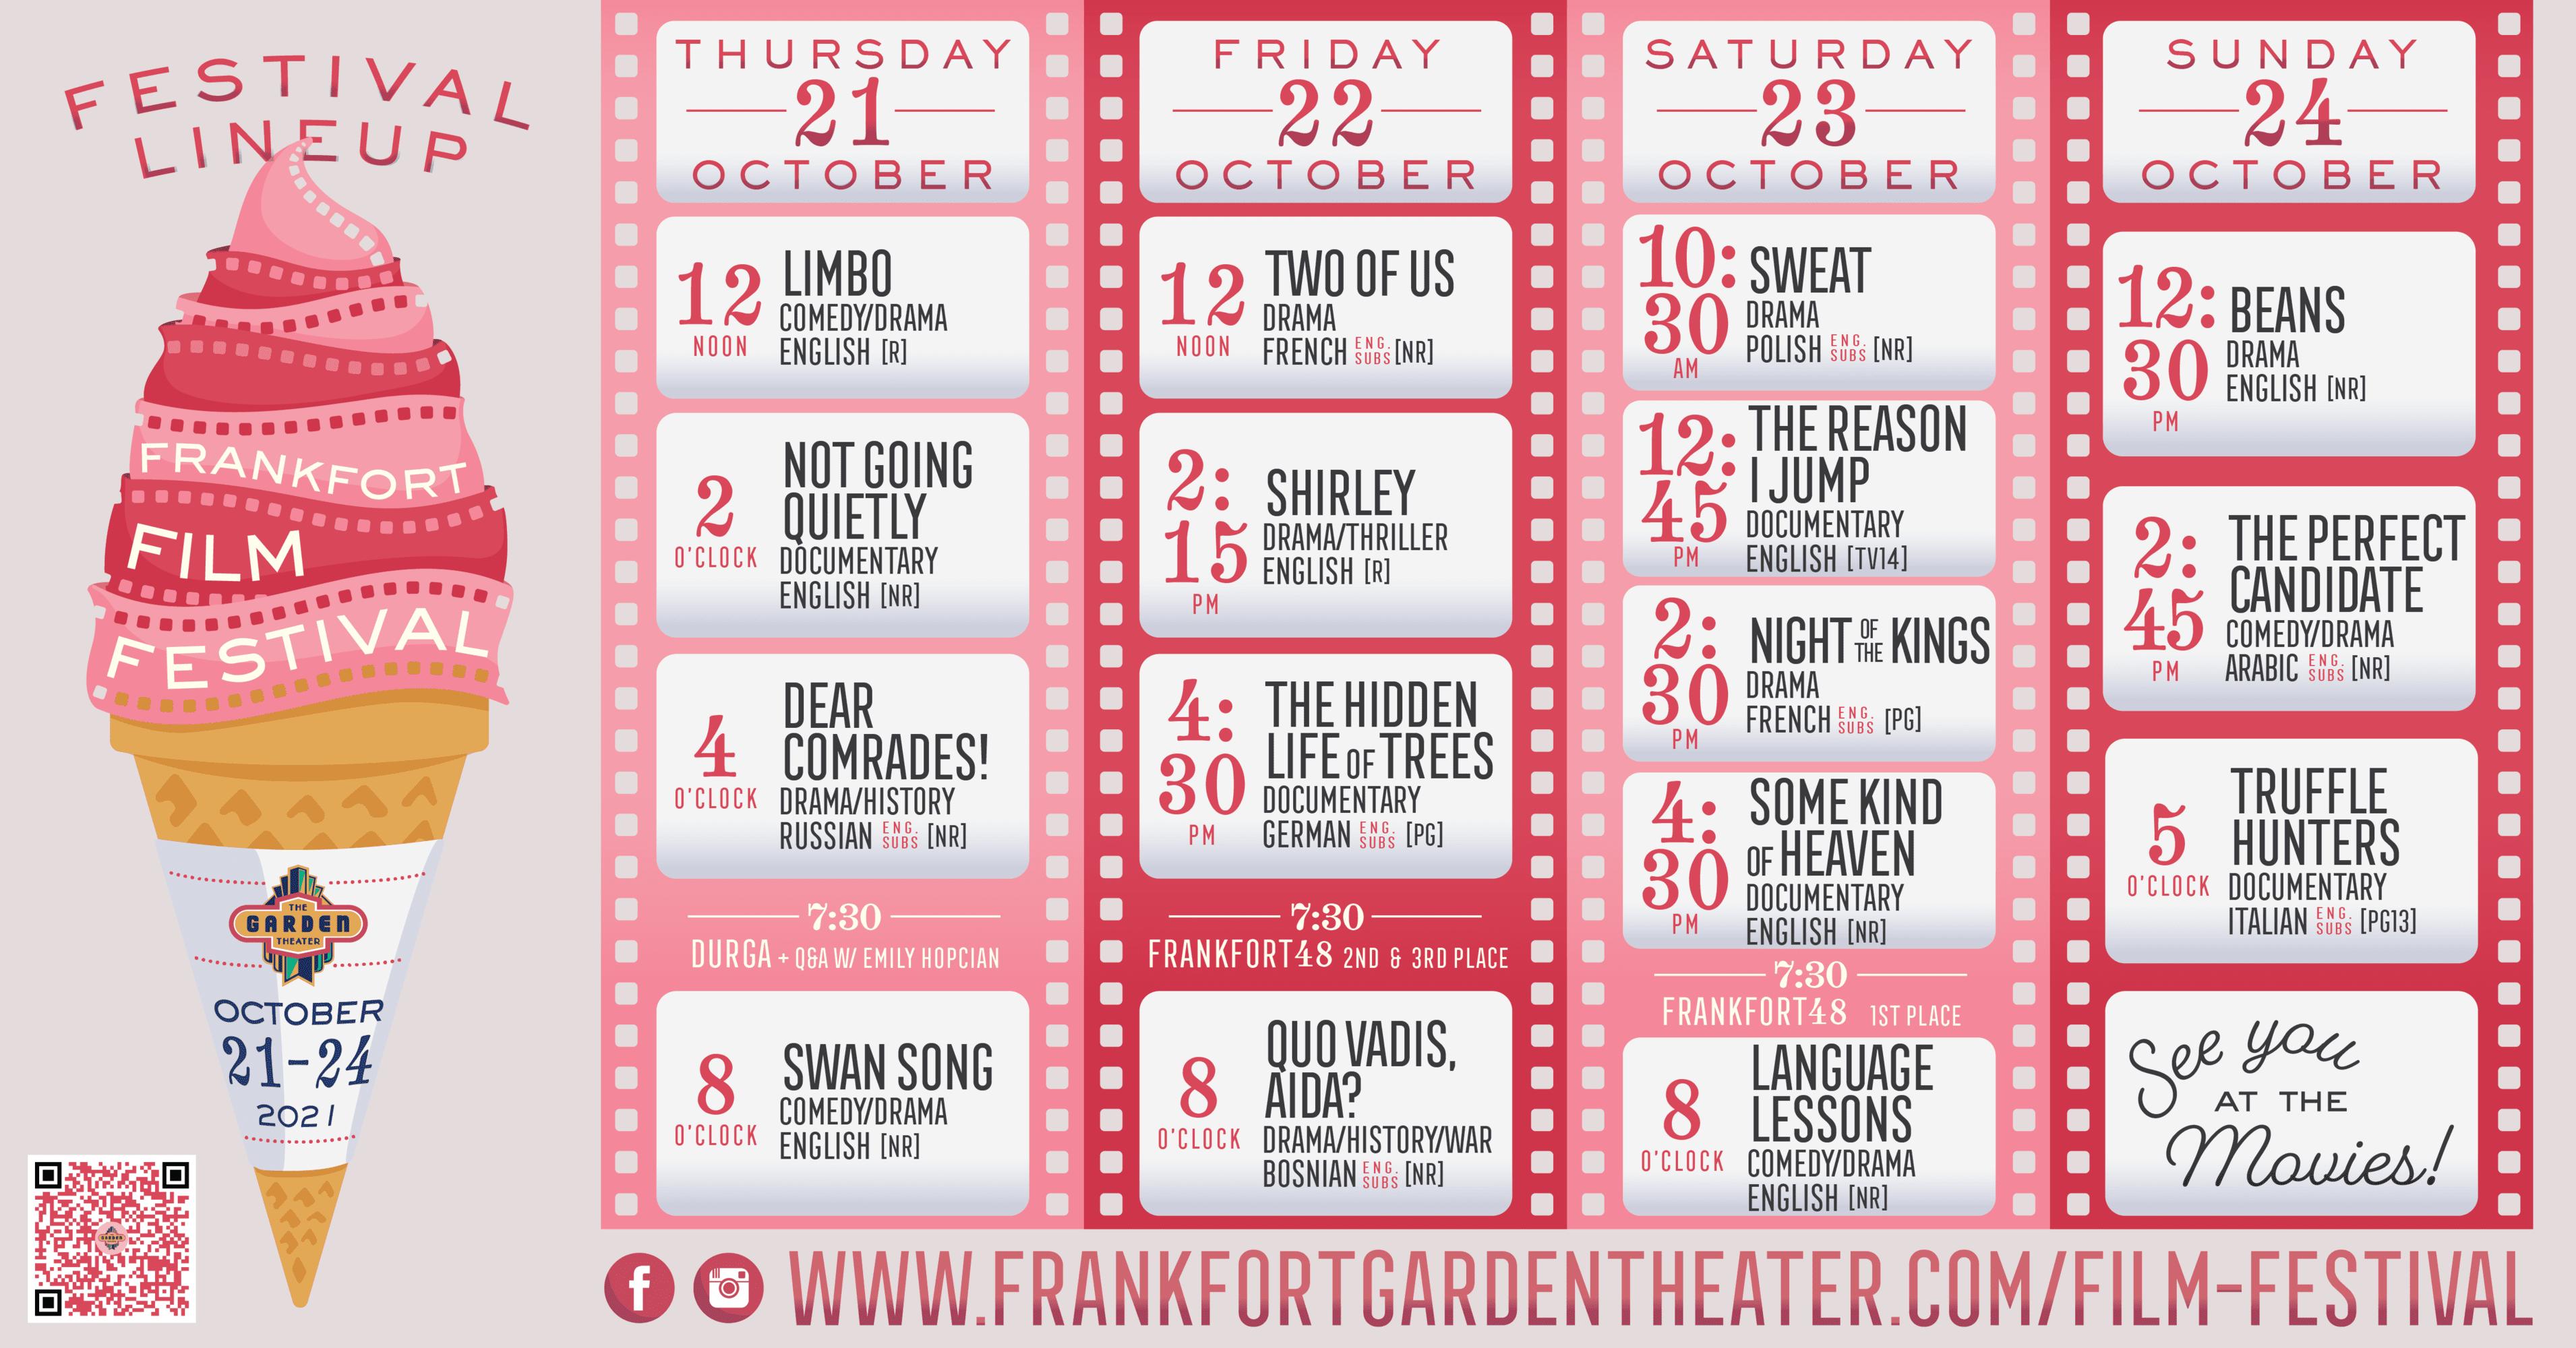 Frankfort Film Festival Lineup